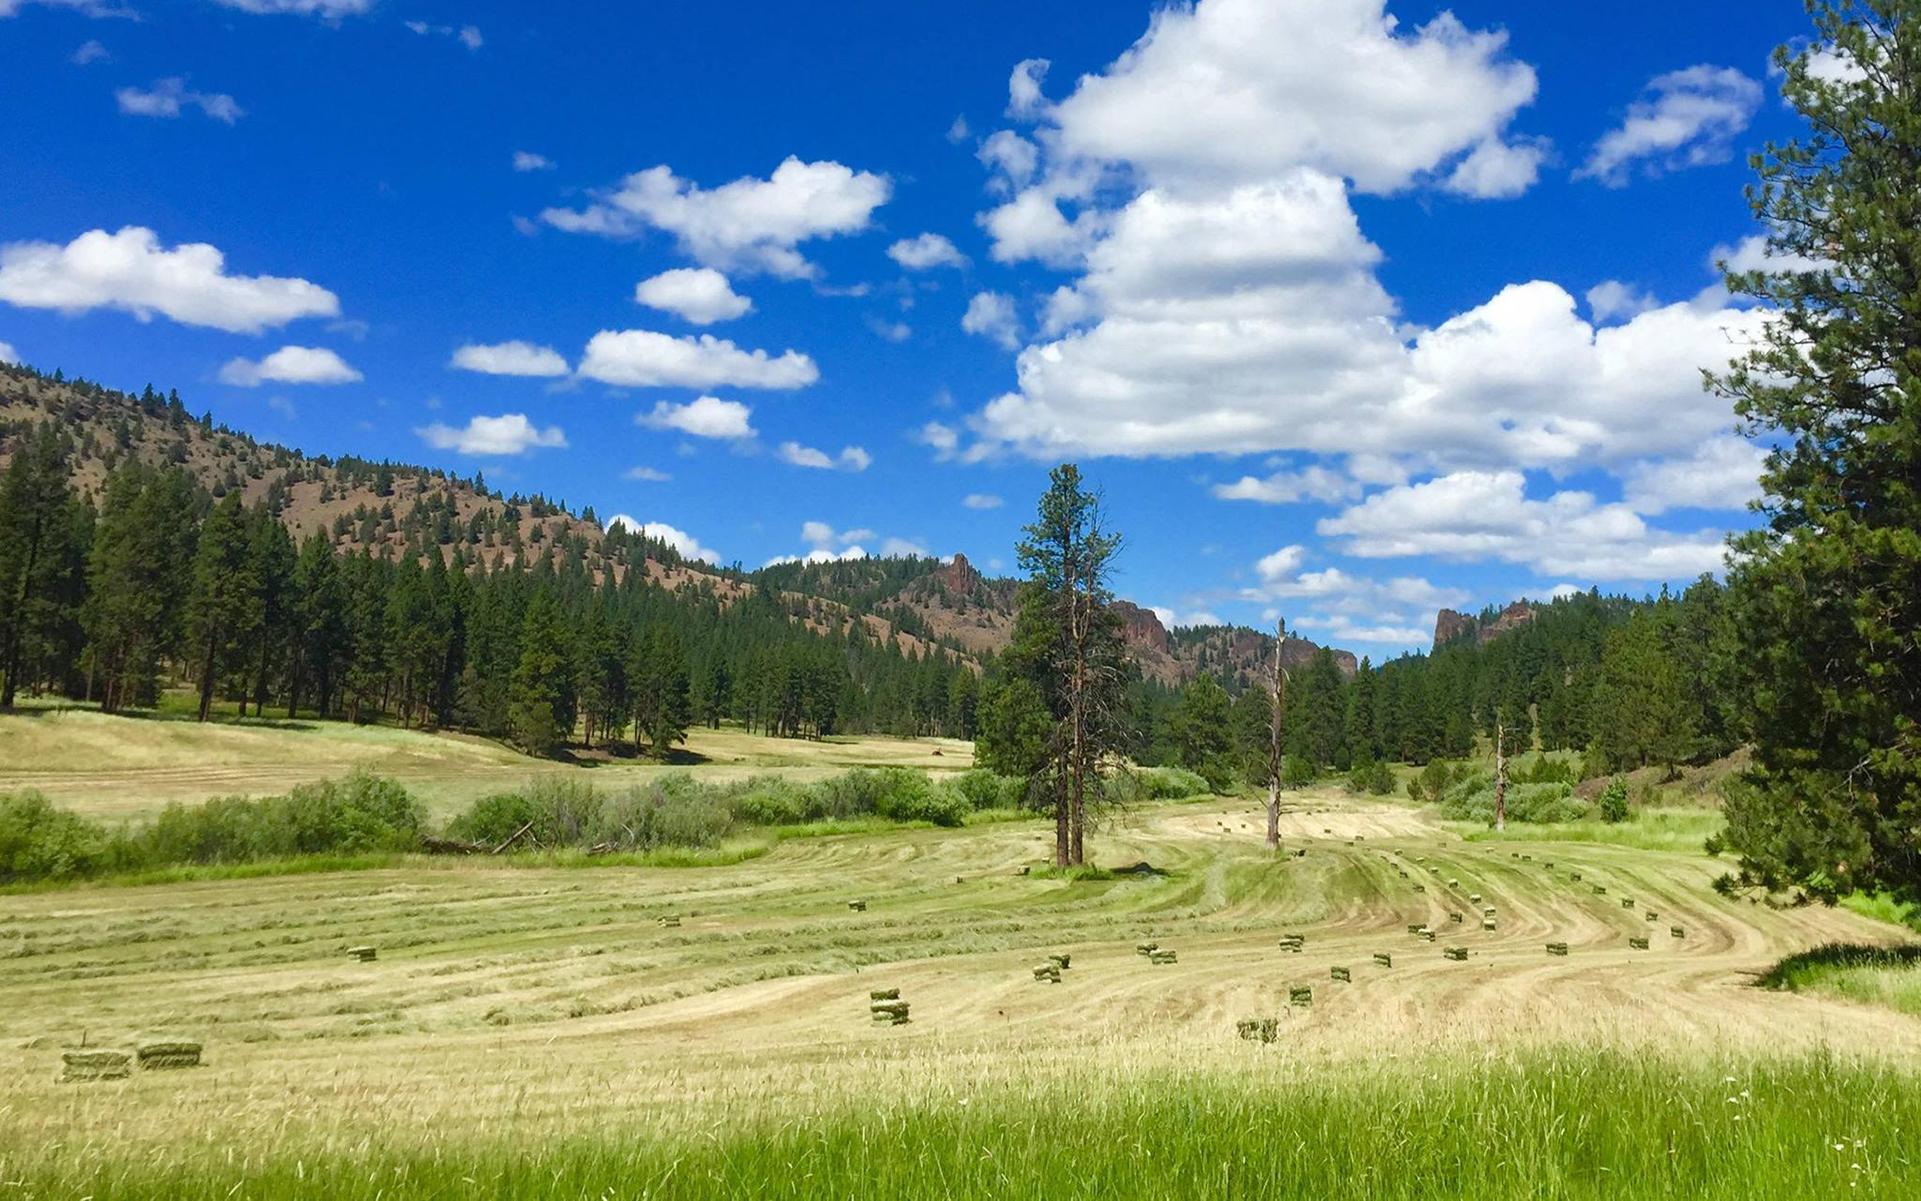 The Ultimate Marijuana Summer Road Trip Through Oregon | Leafly